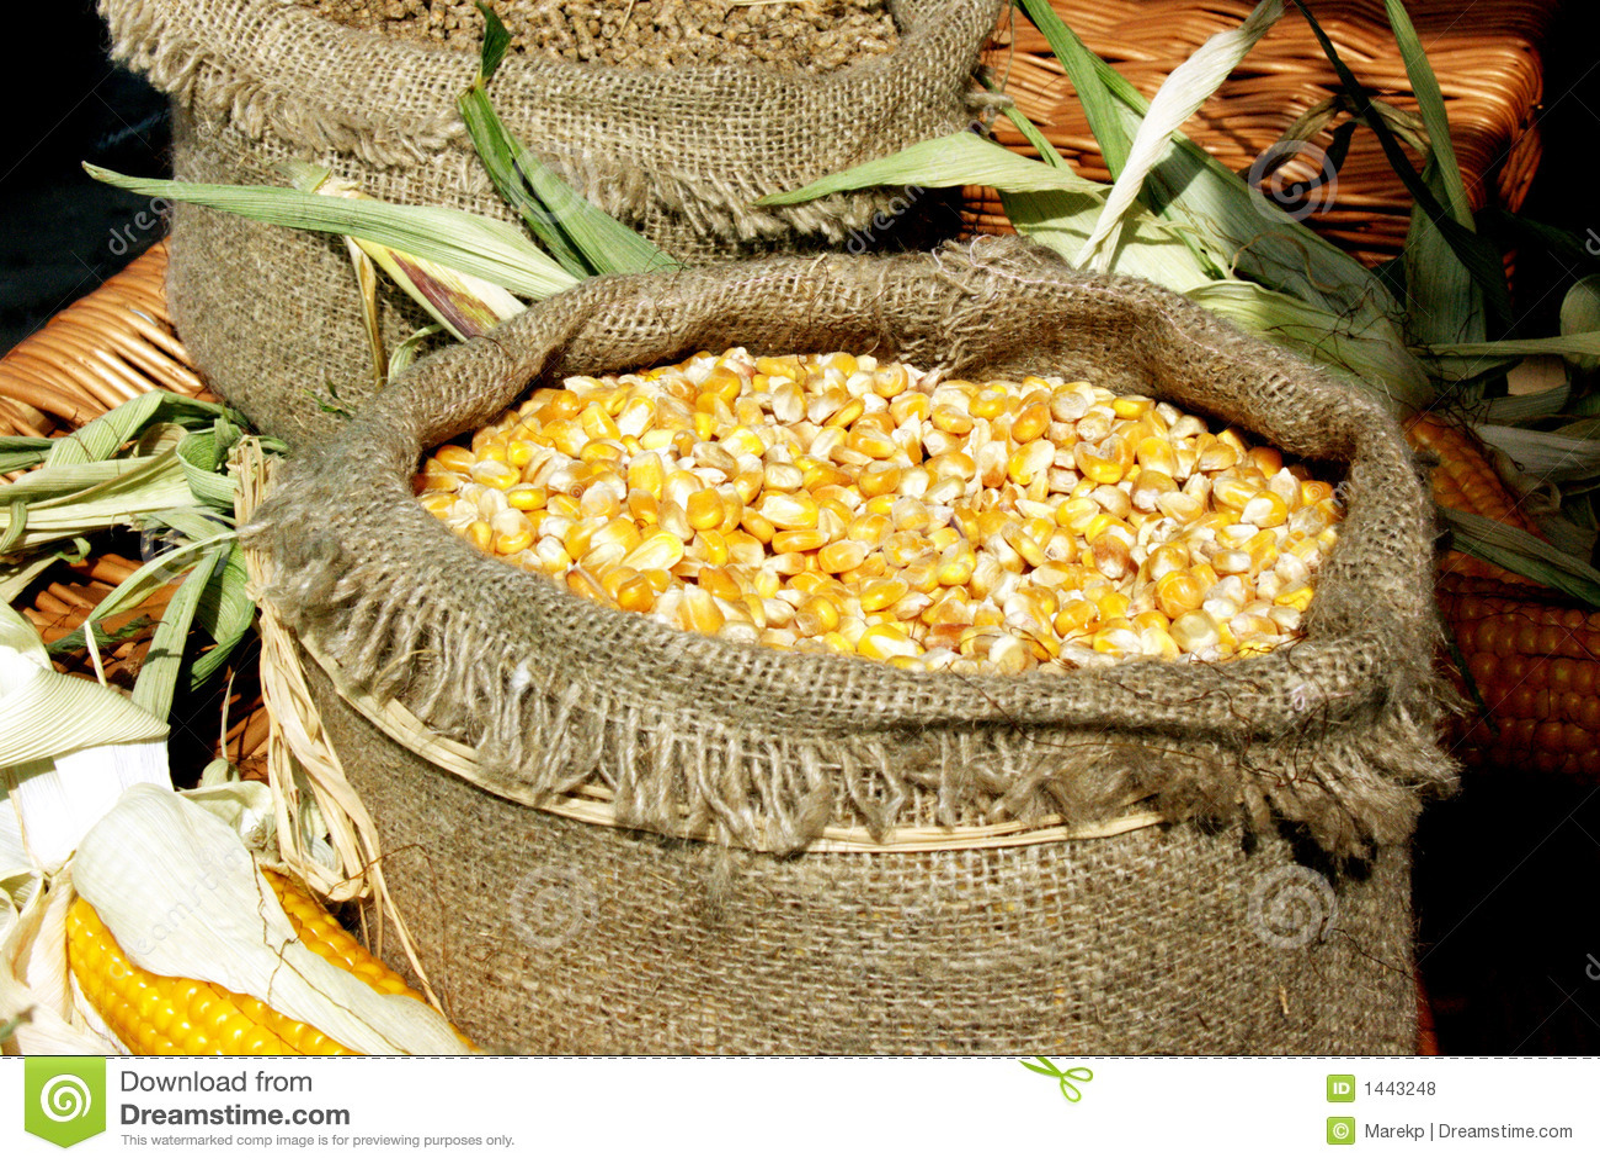 how to build a corn maze